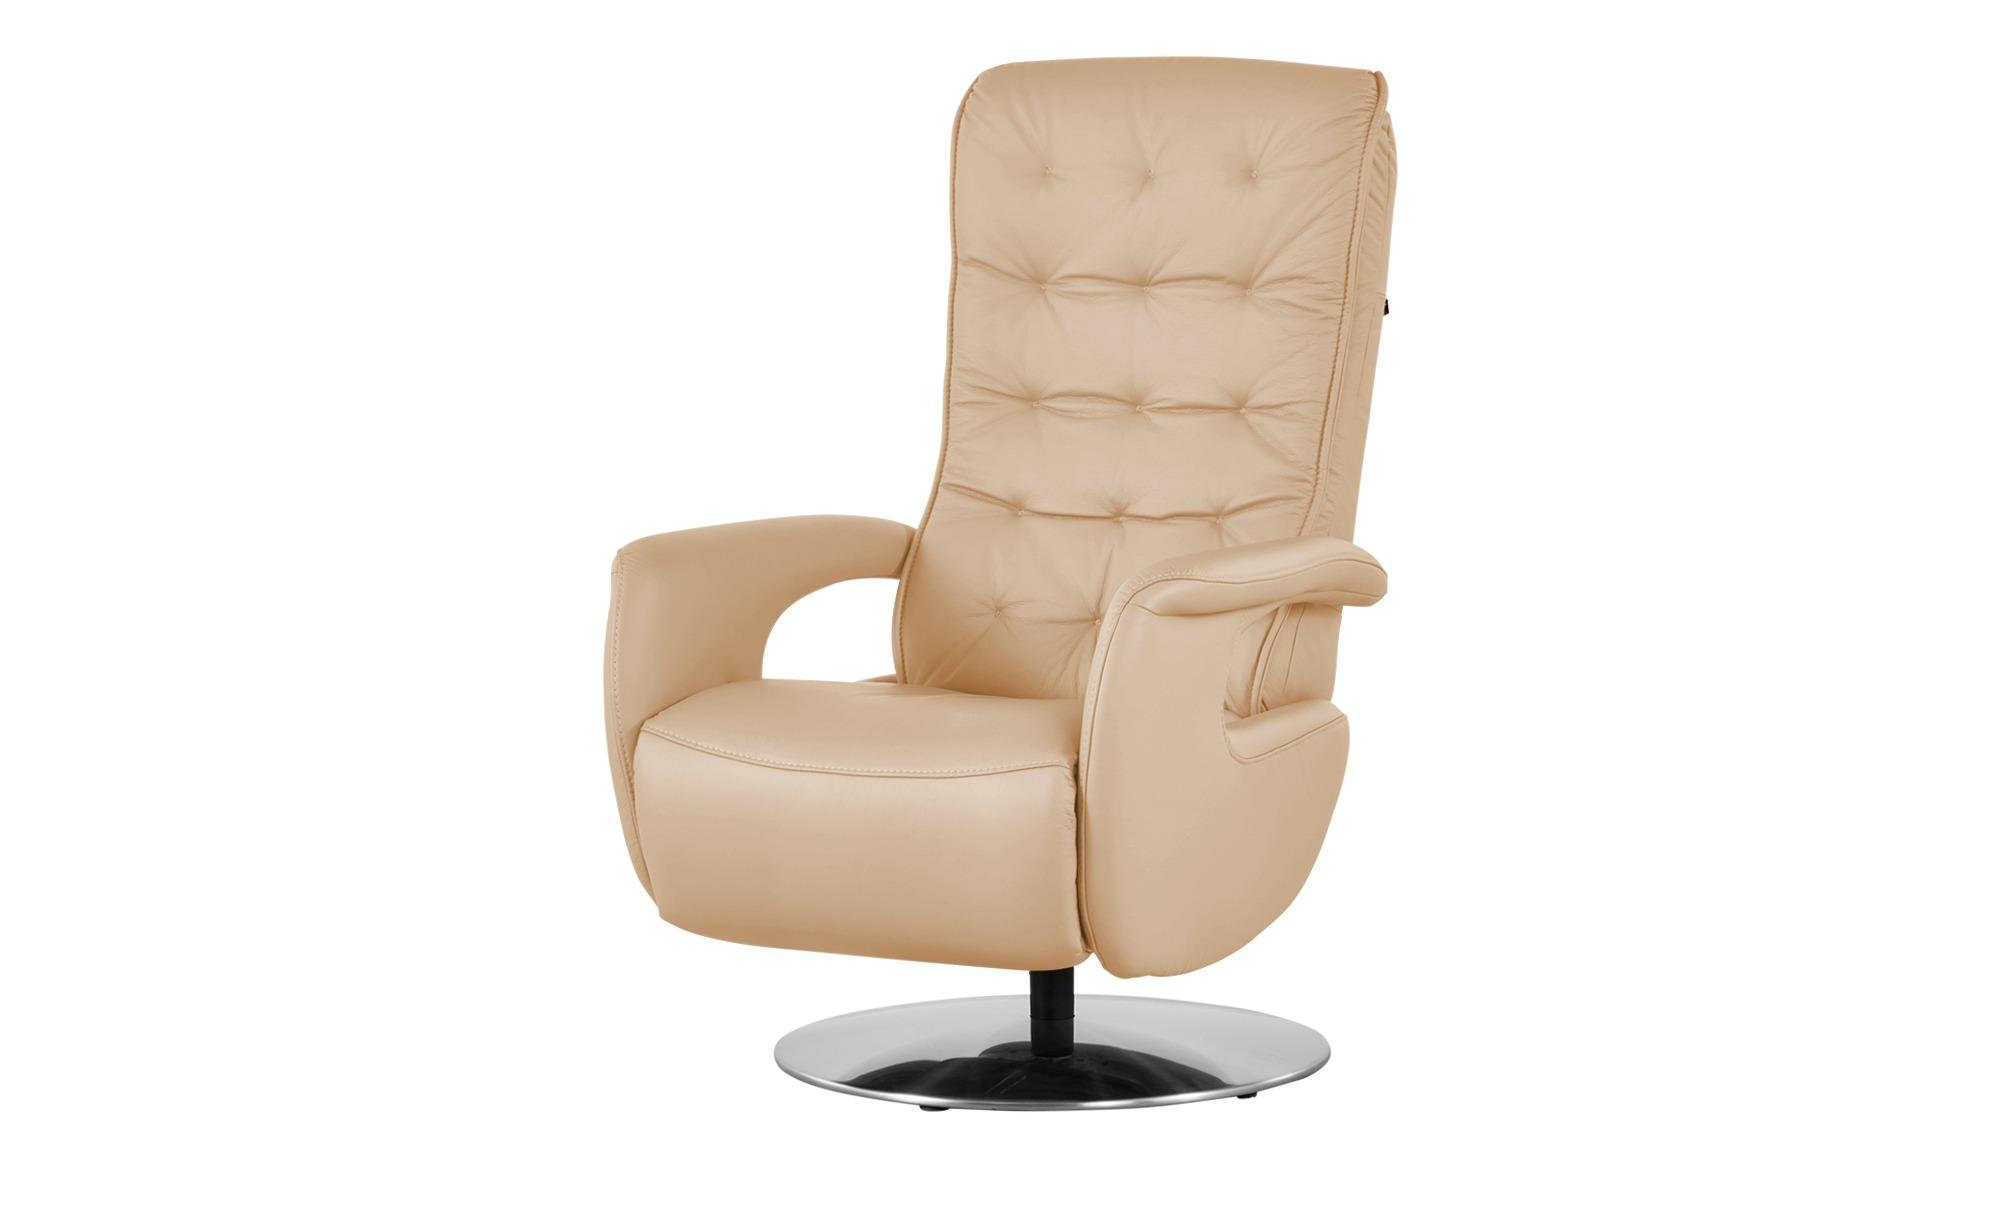 Hukla Relaxsessel  Smilla ¦ beige ¦ Maße (cm): B: 72 H: 113 T: 83 Polstermöbel > Sessel > Ledersessel - Höffner